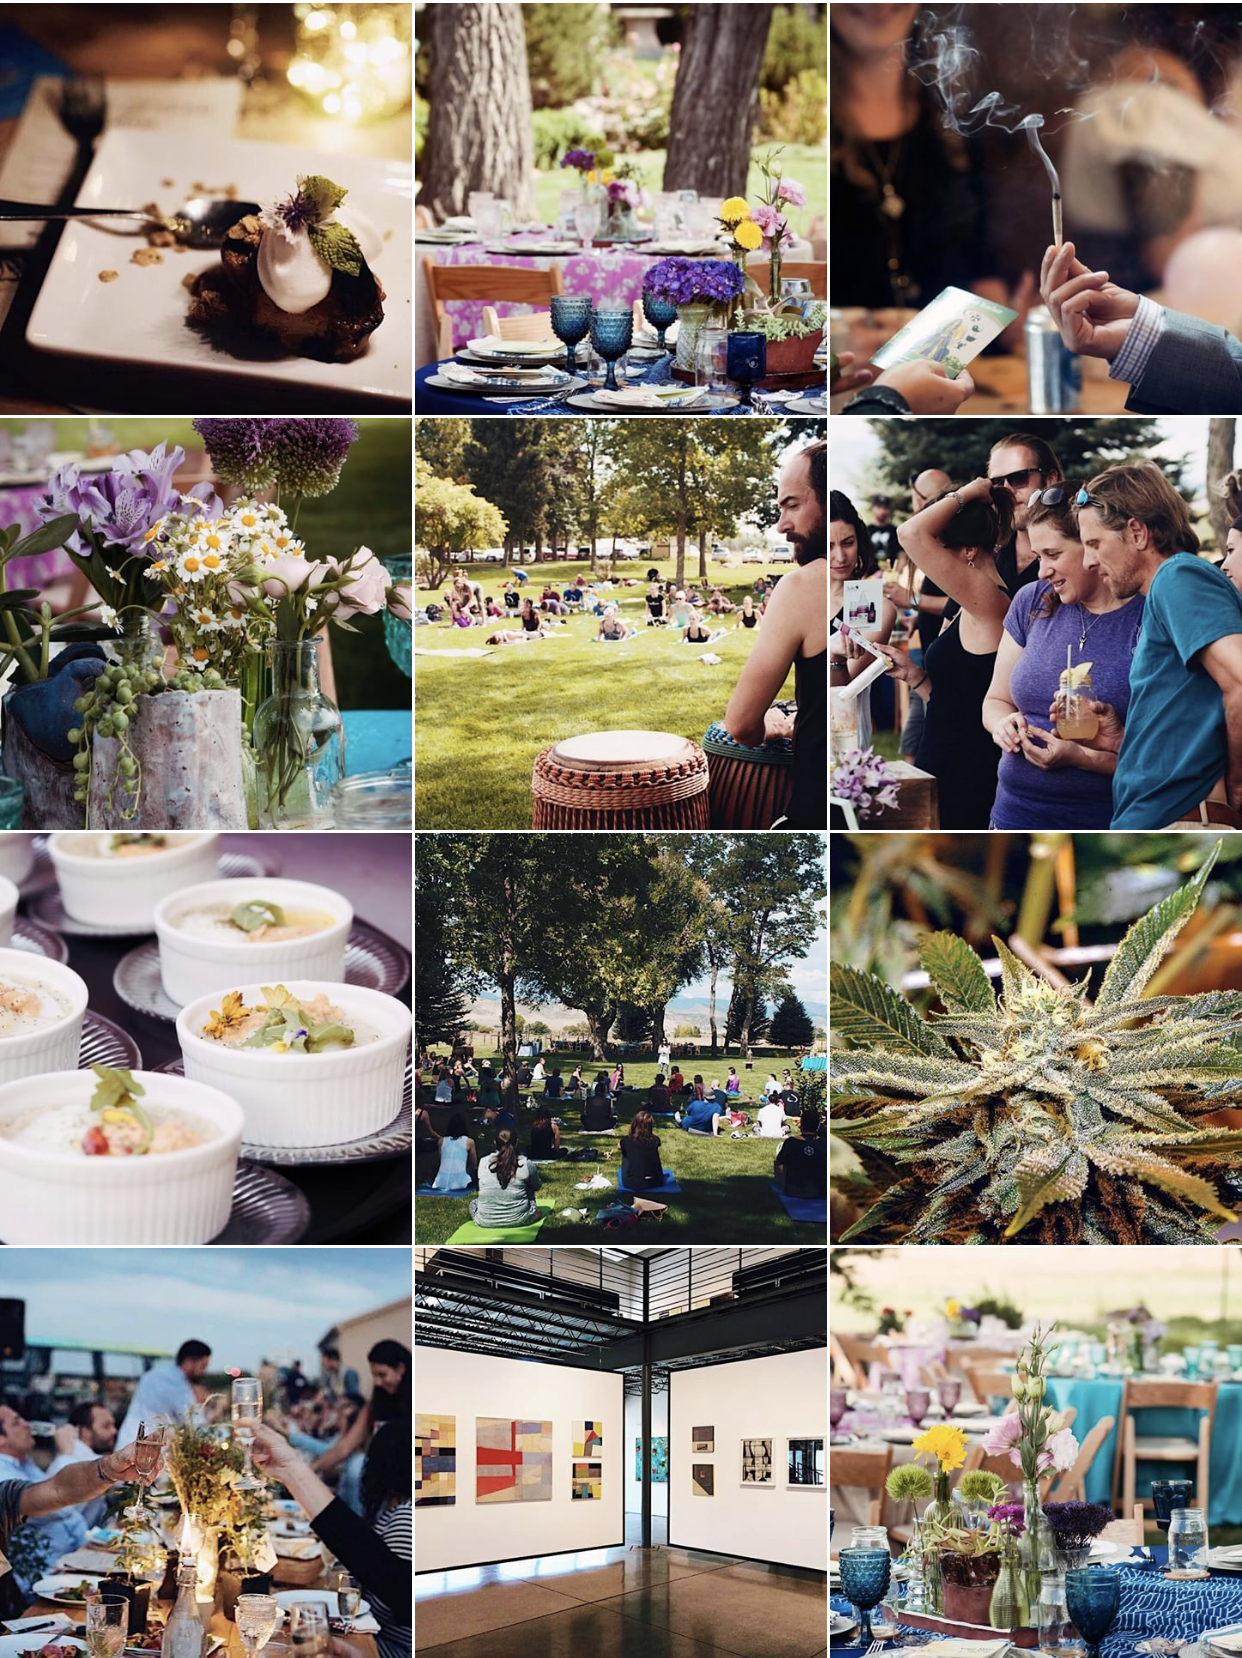 Mason Jar Event Group - Instagram: @masonjareventgroupFacebook: Mason Jar Event GroupPinterest: Mason Jar Event GroupLive Event Coverage